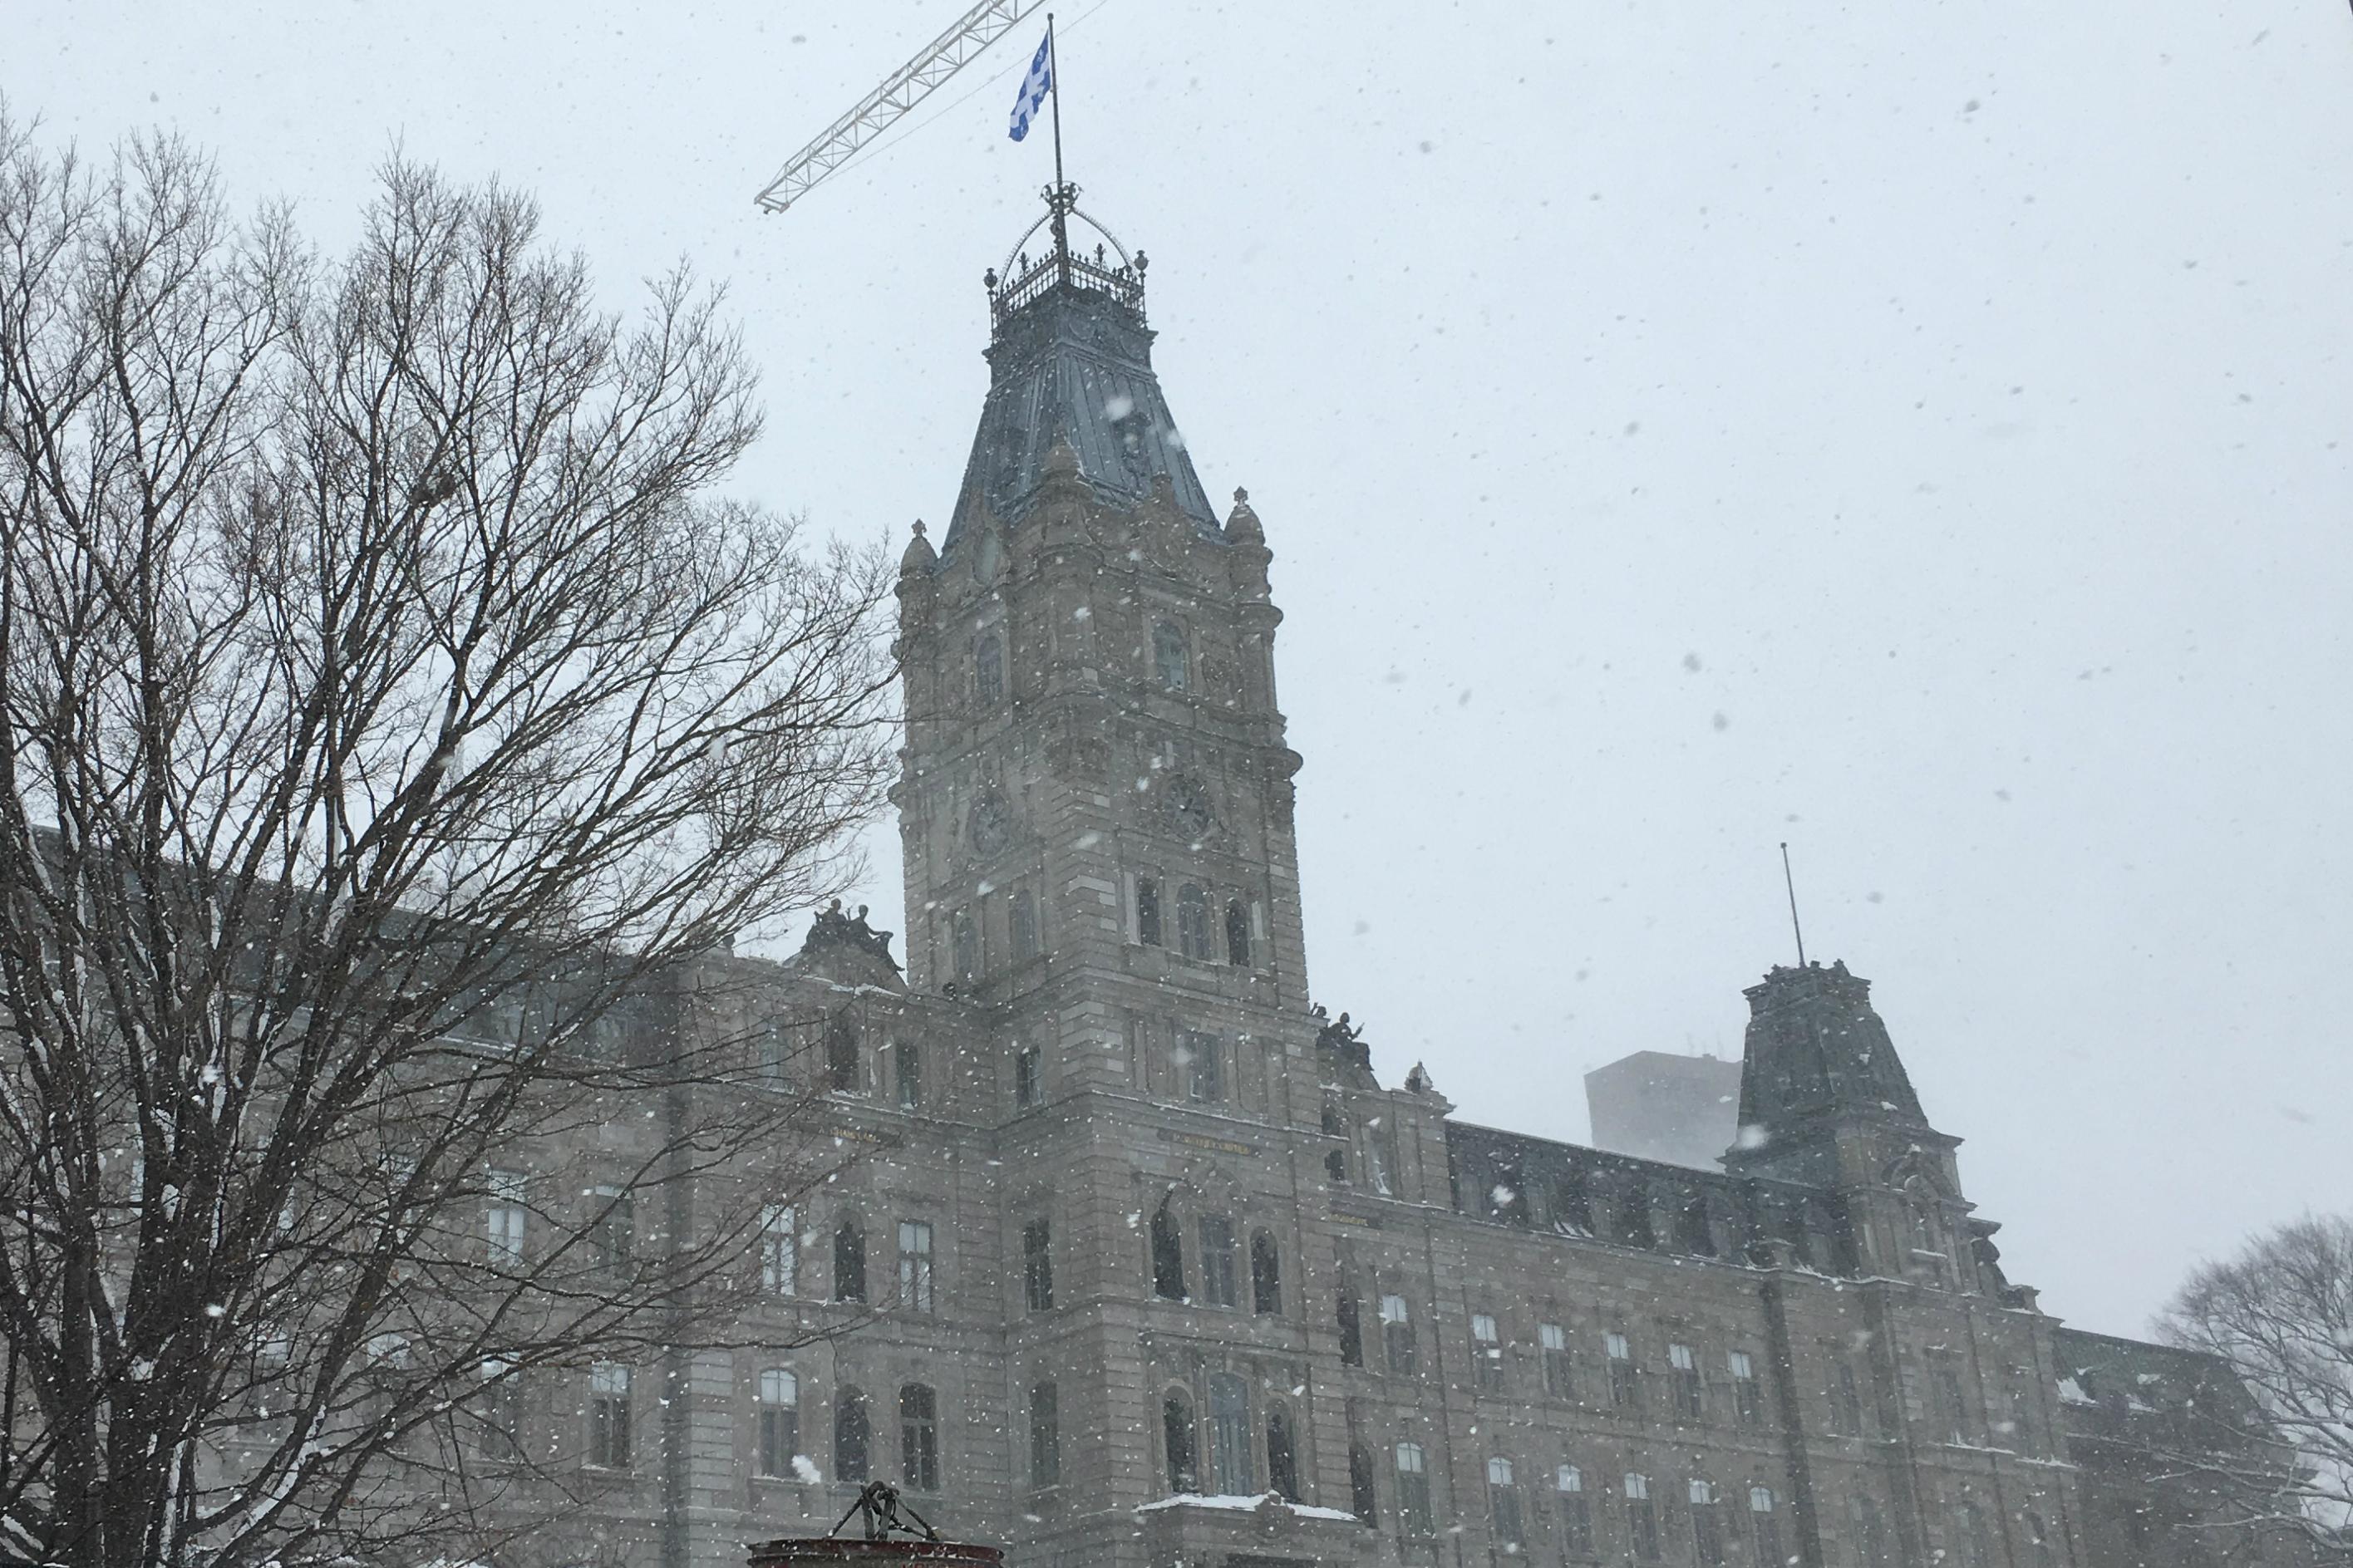 The Parliament Building in Quebec City, Quebec, home of the Parliament of Quebec, on Dec. 12, 2016. (Krestia DeGeorge / Arctic Now)